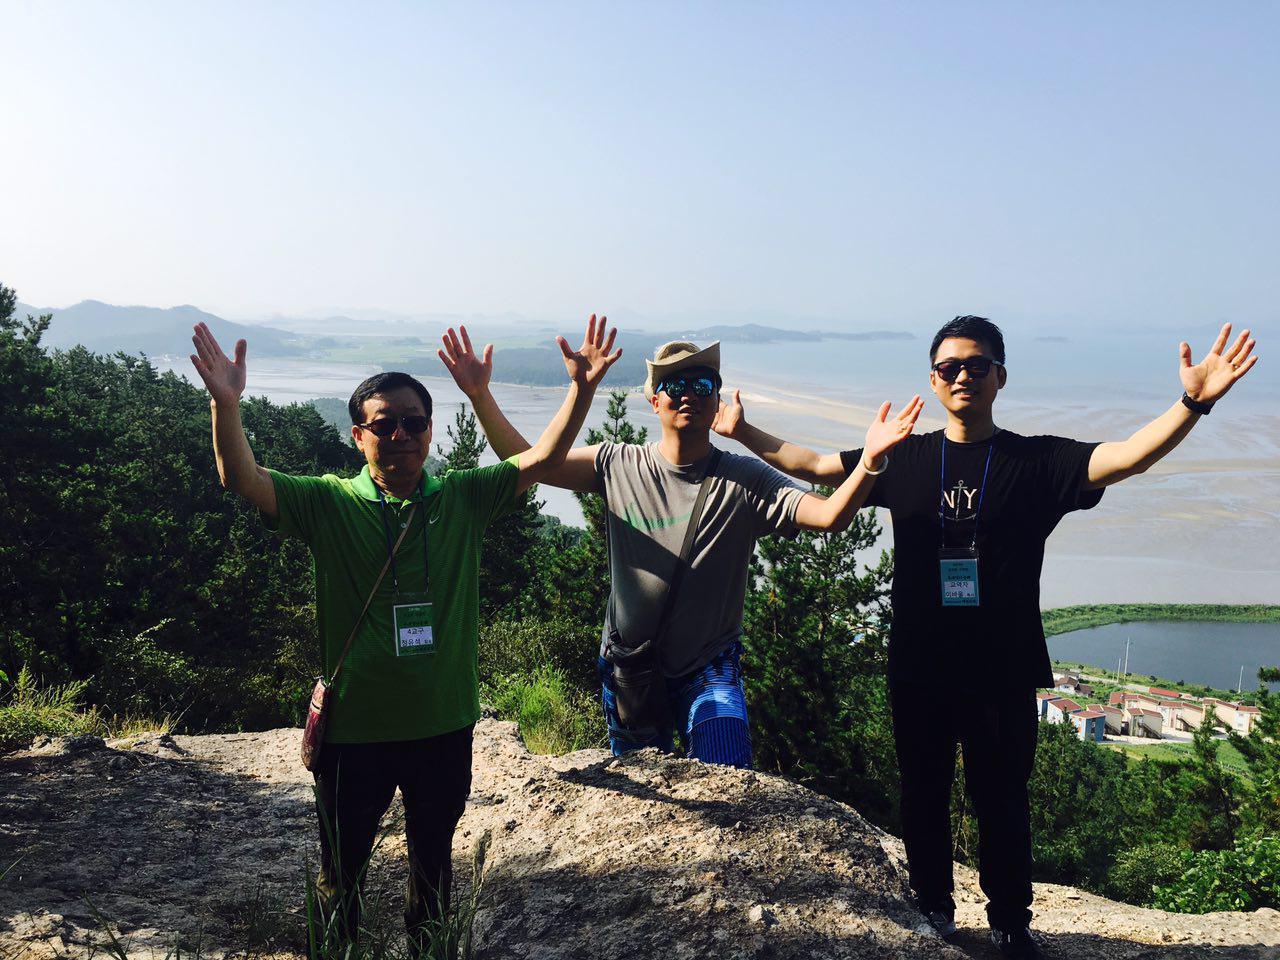 photo_2016-08-13_14-19-41.jpg